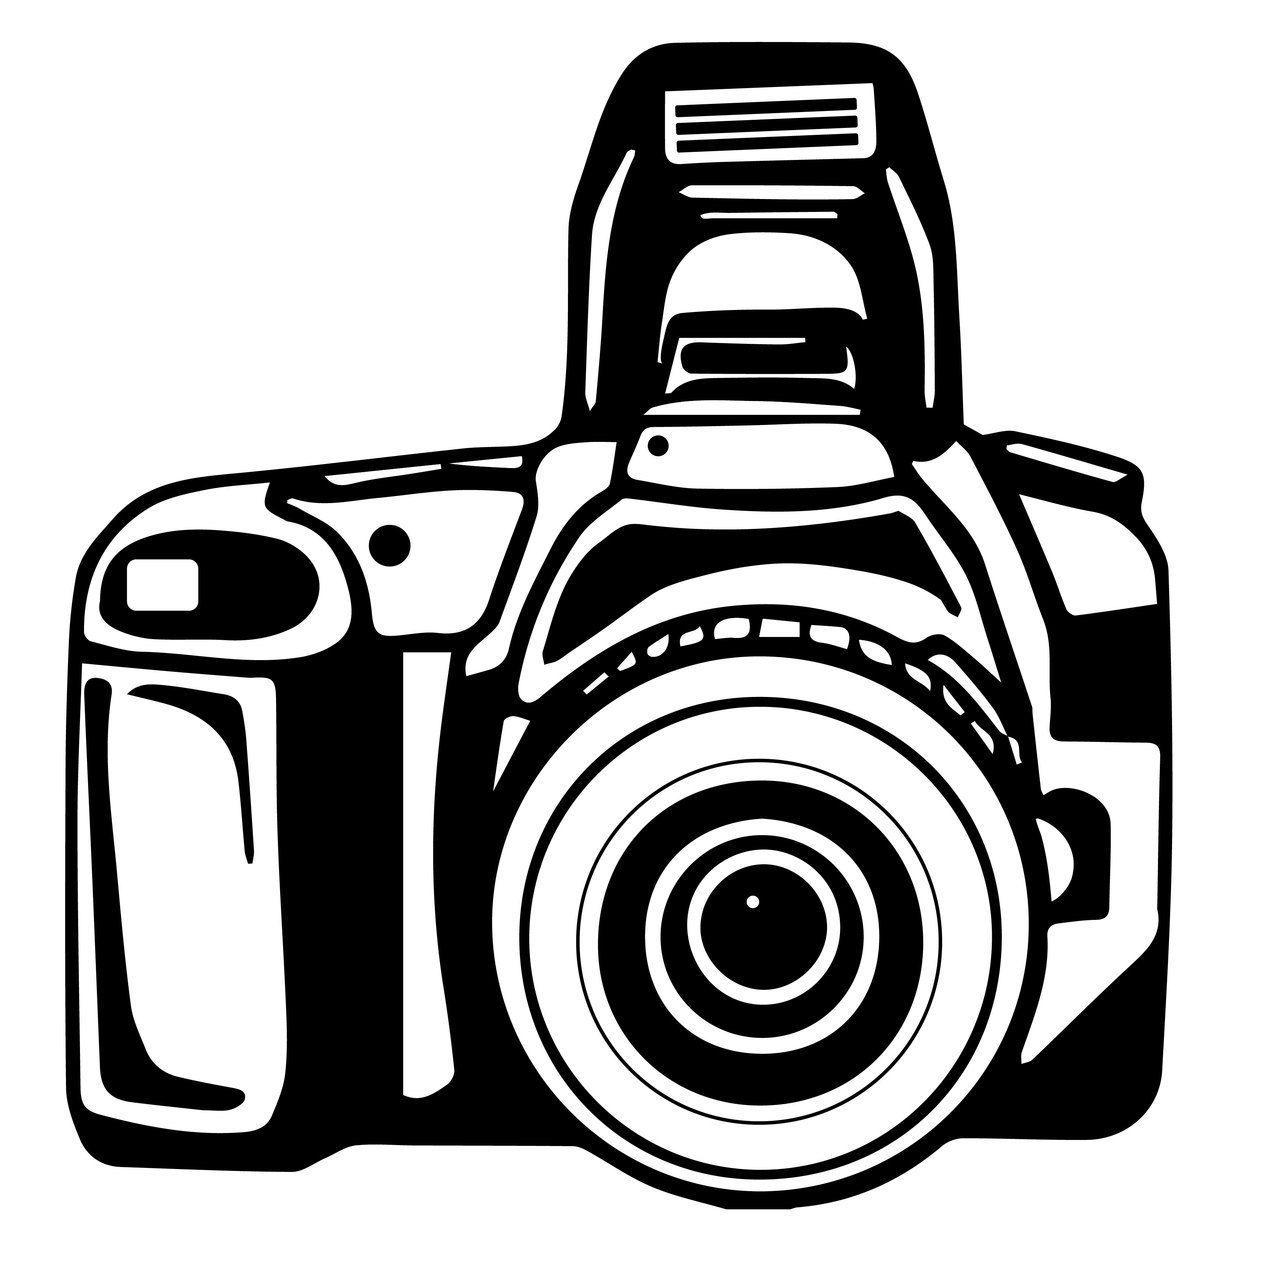 Pin on Dslr Photography Tips Photo Editing